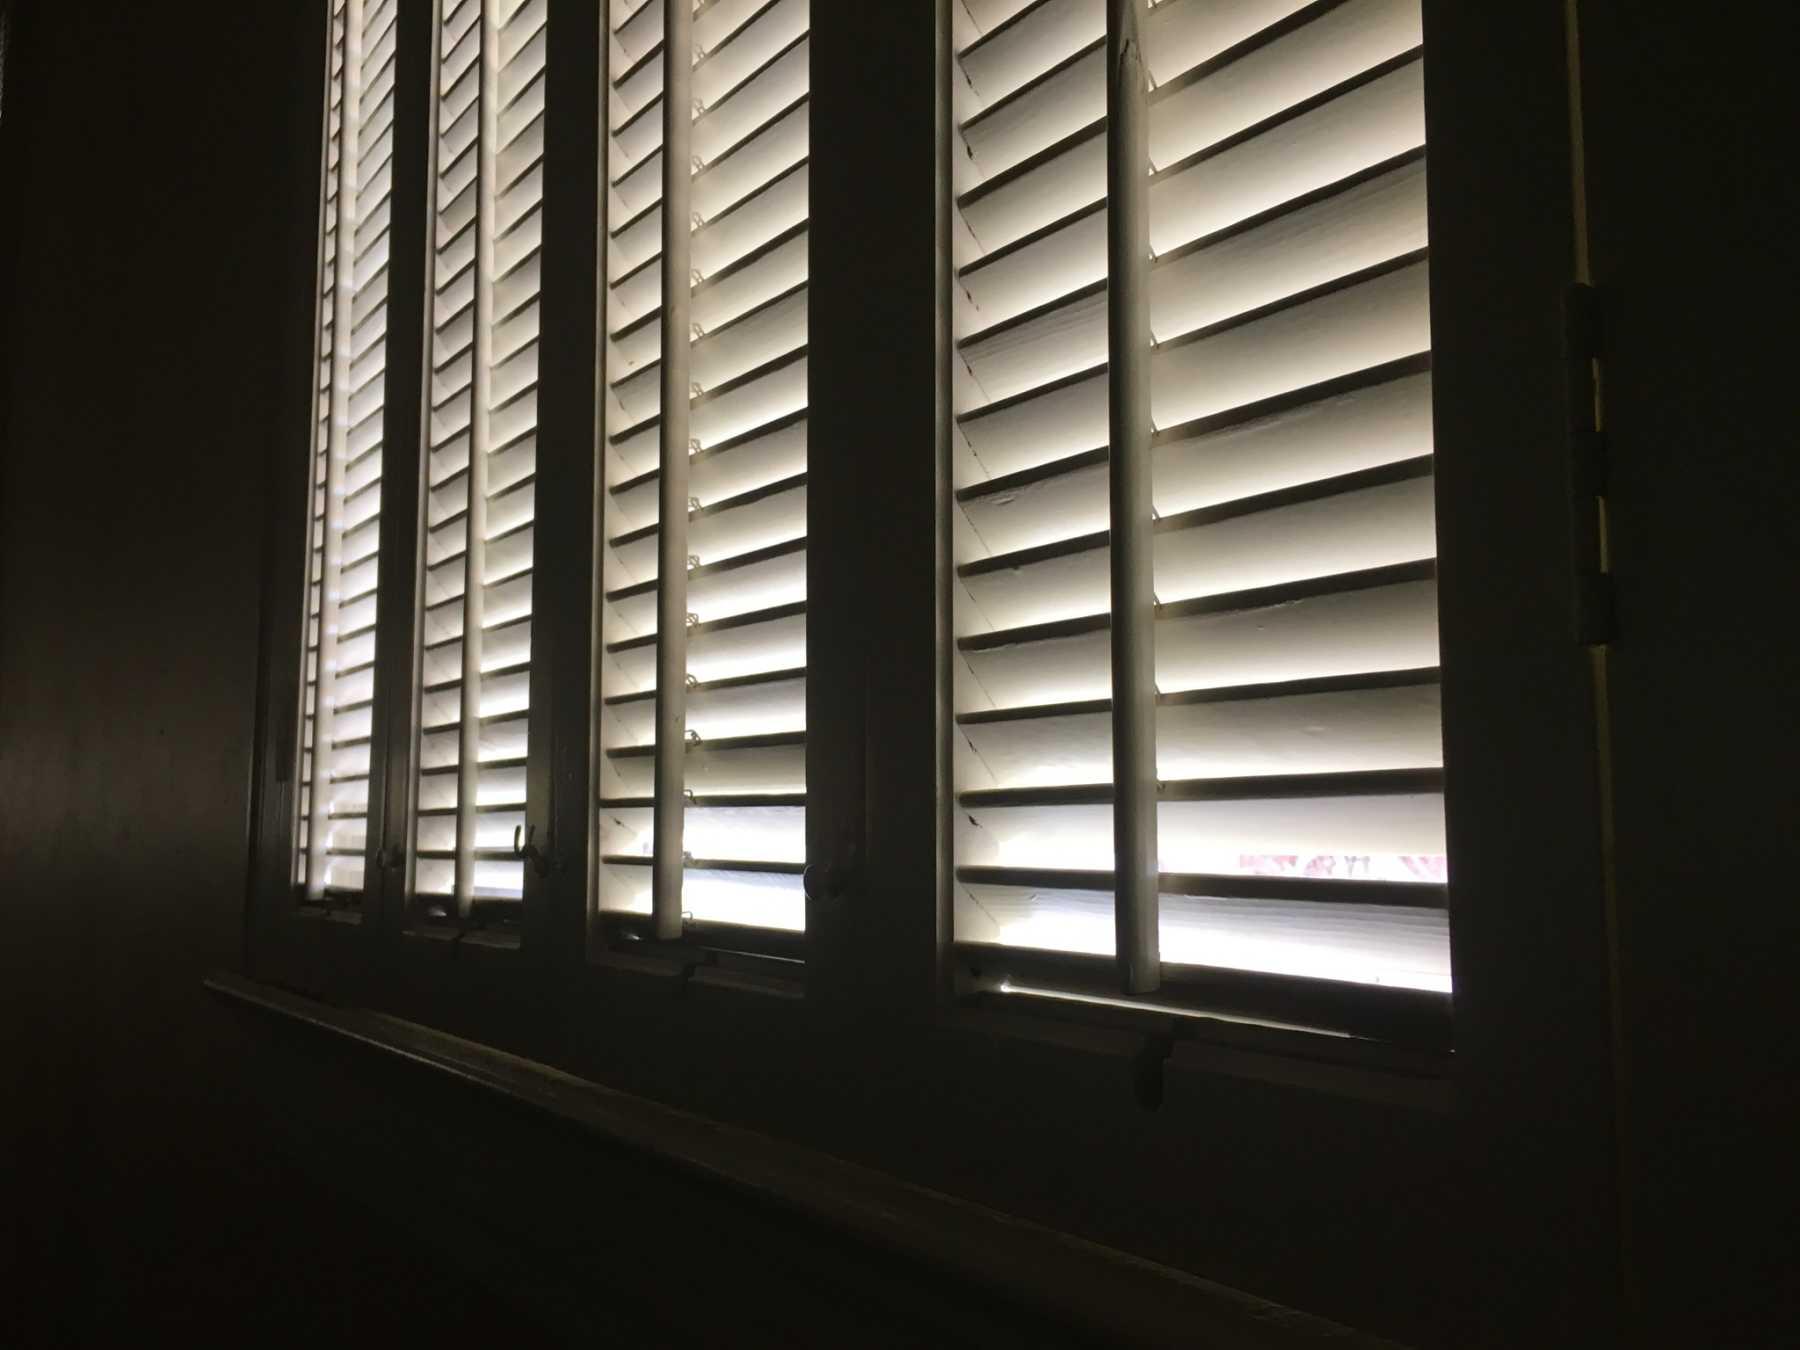 Elevate Kindness – a Prescription for Dark Days